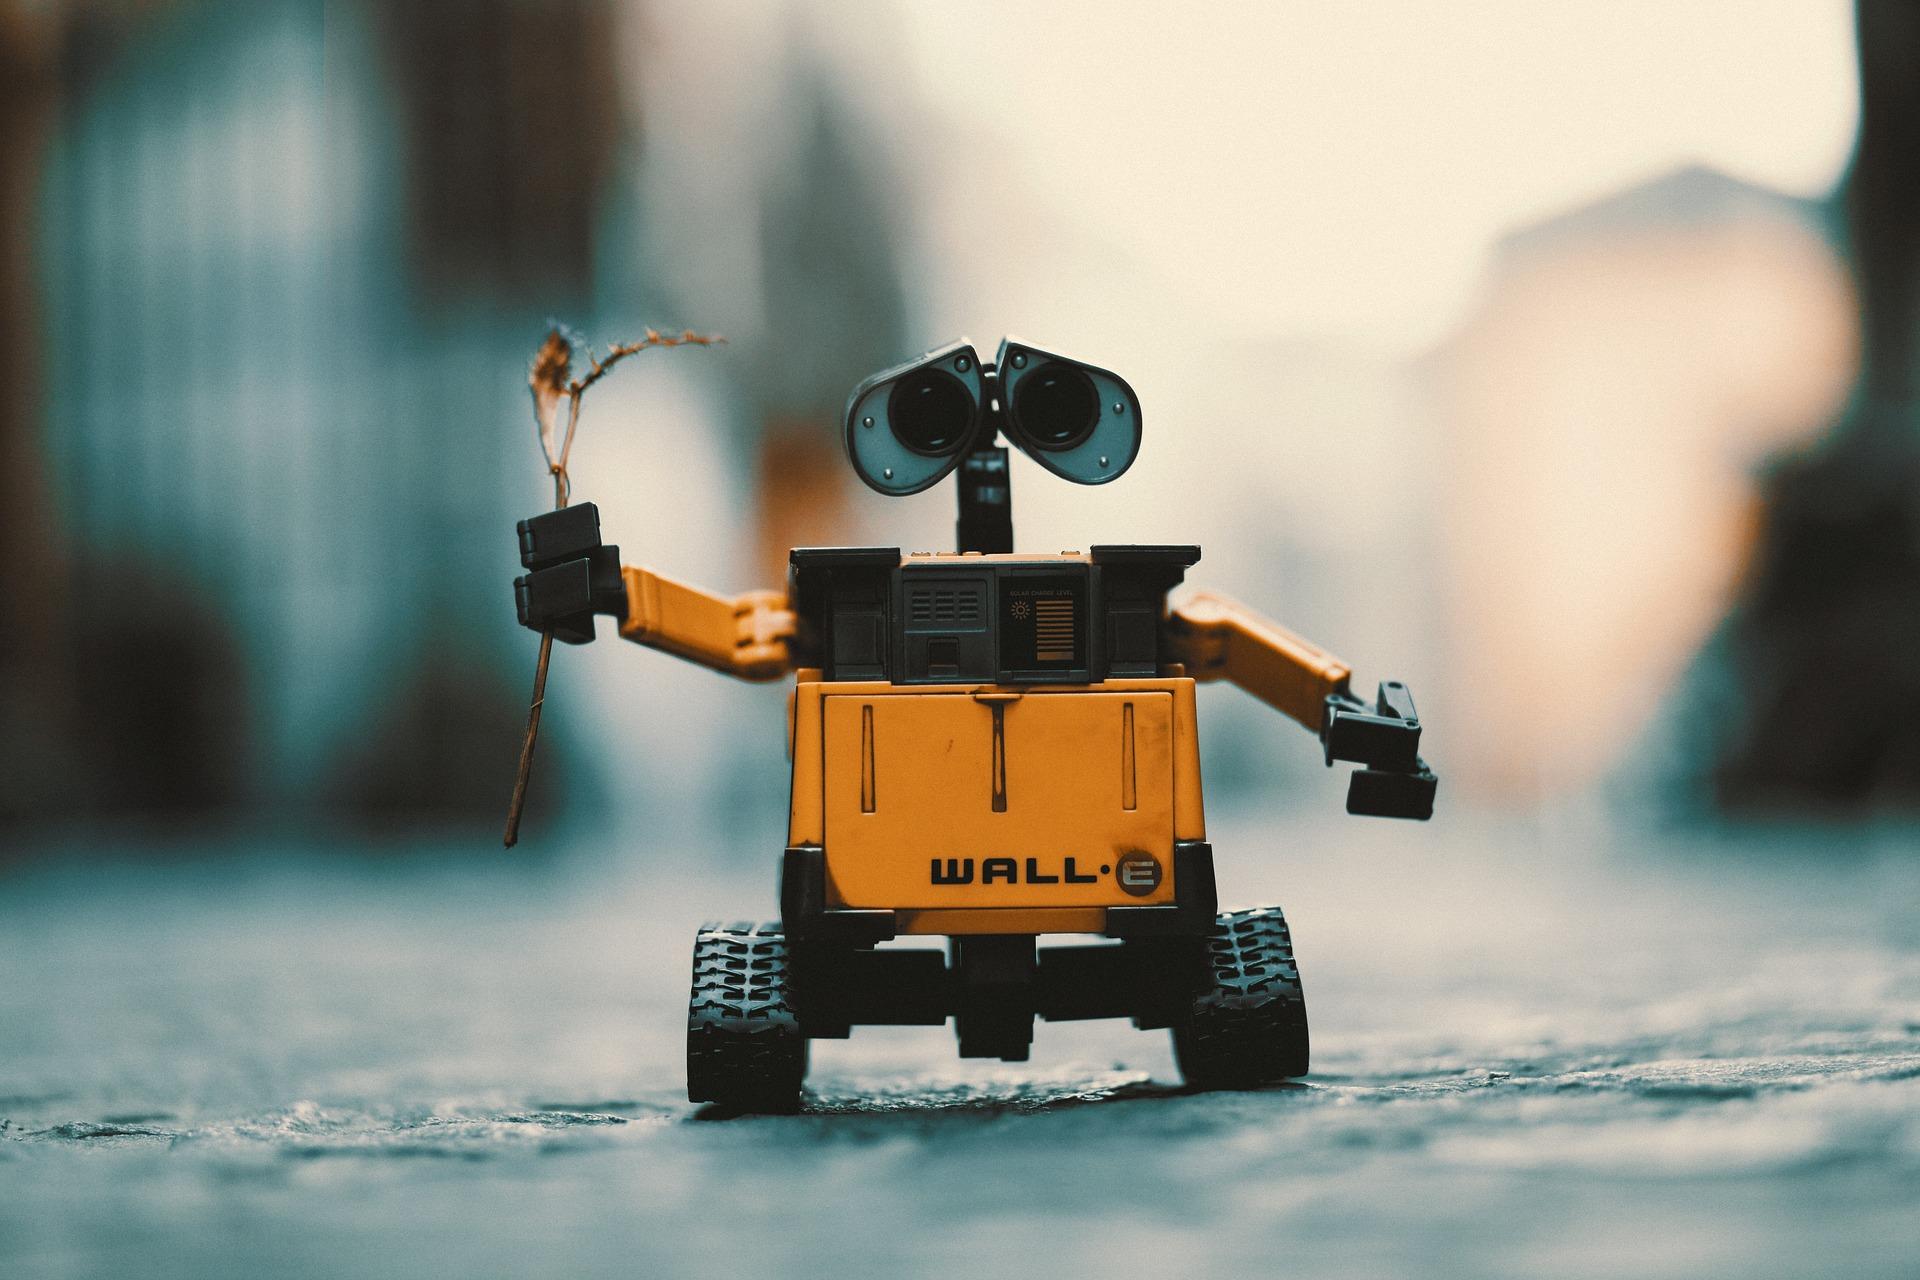 General 1920x1280 WALL·E WALL-E robot